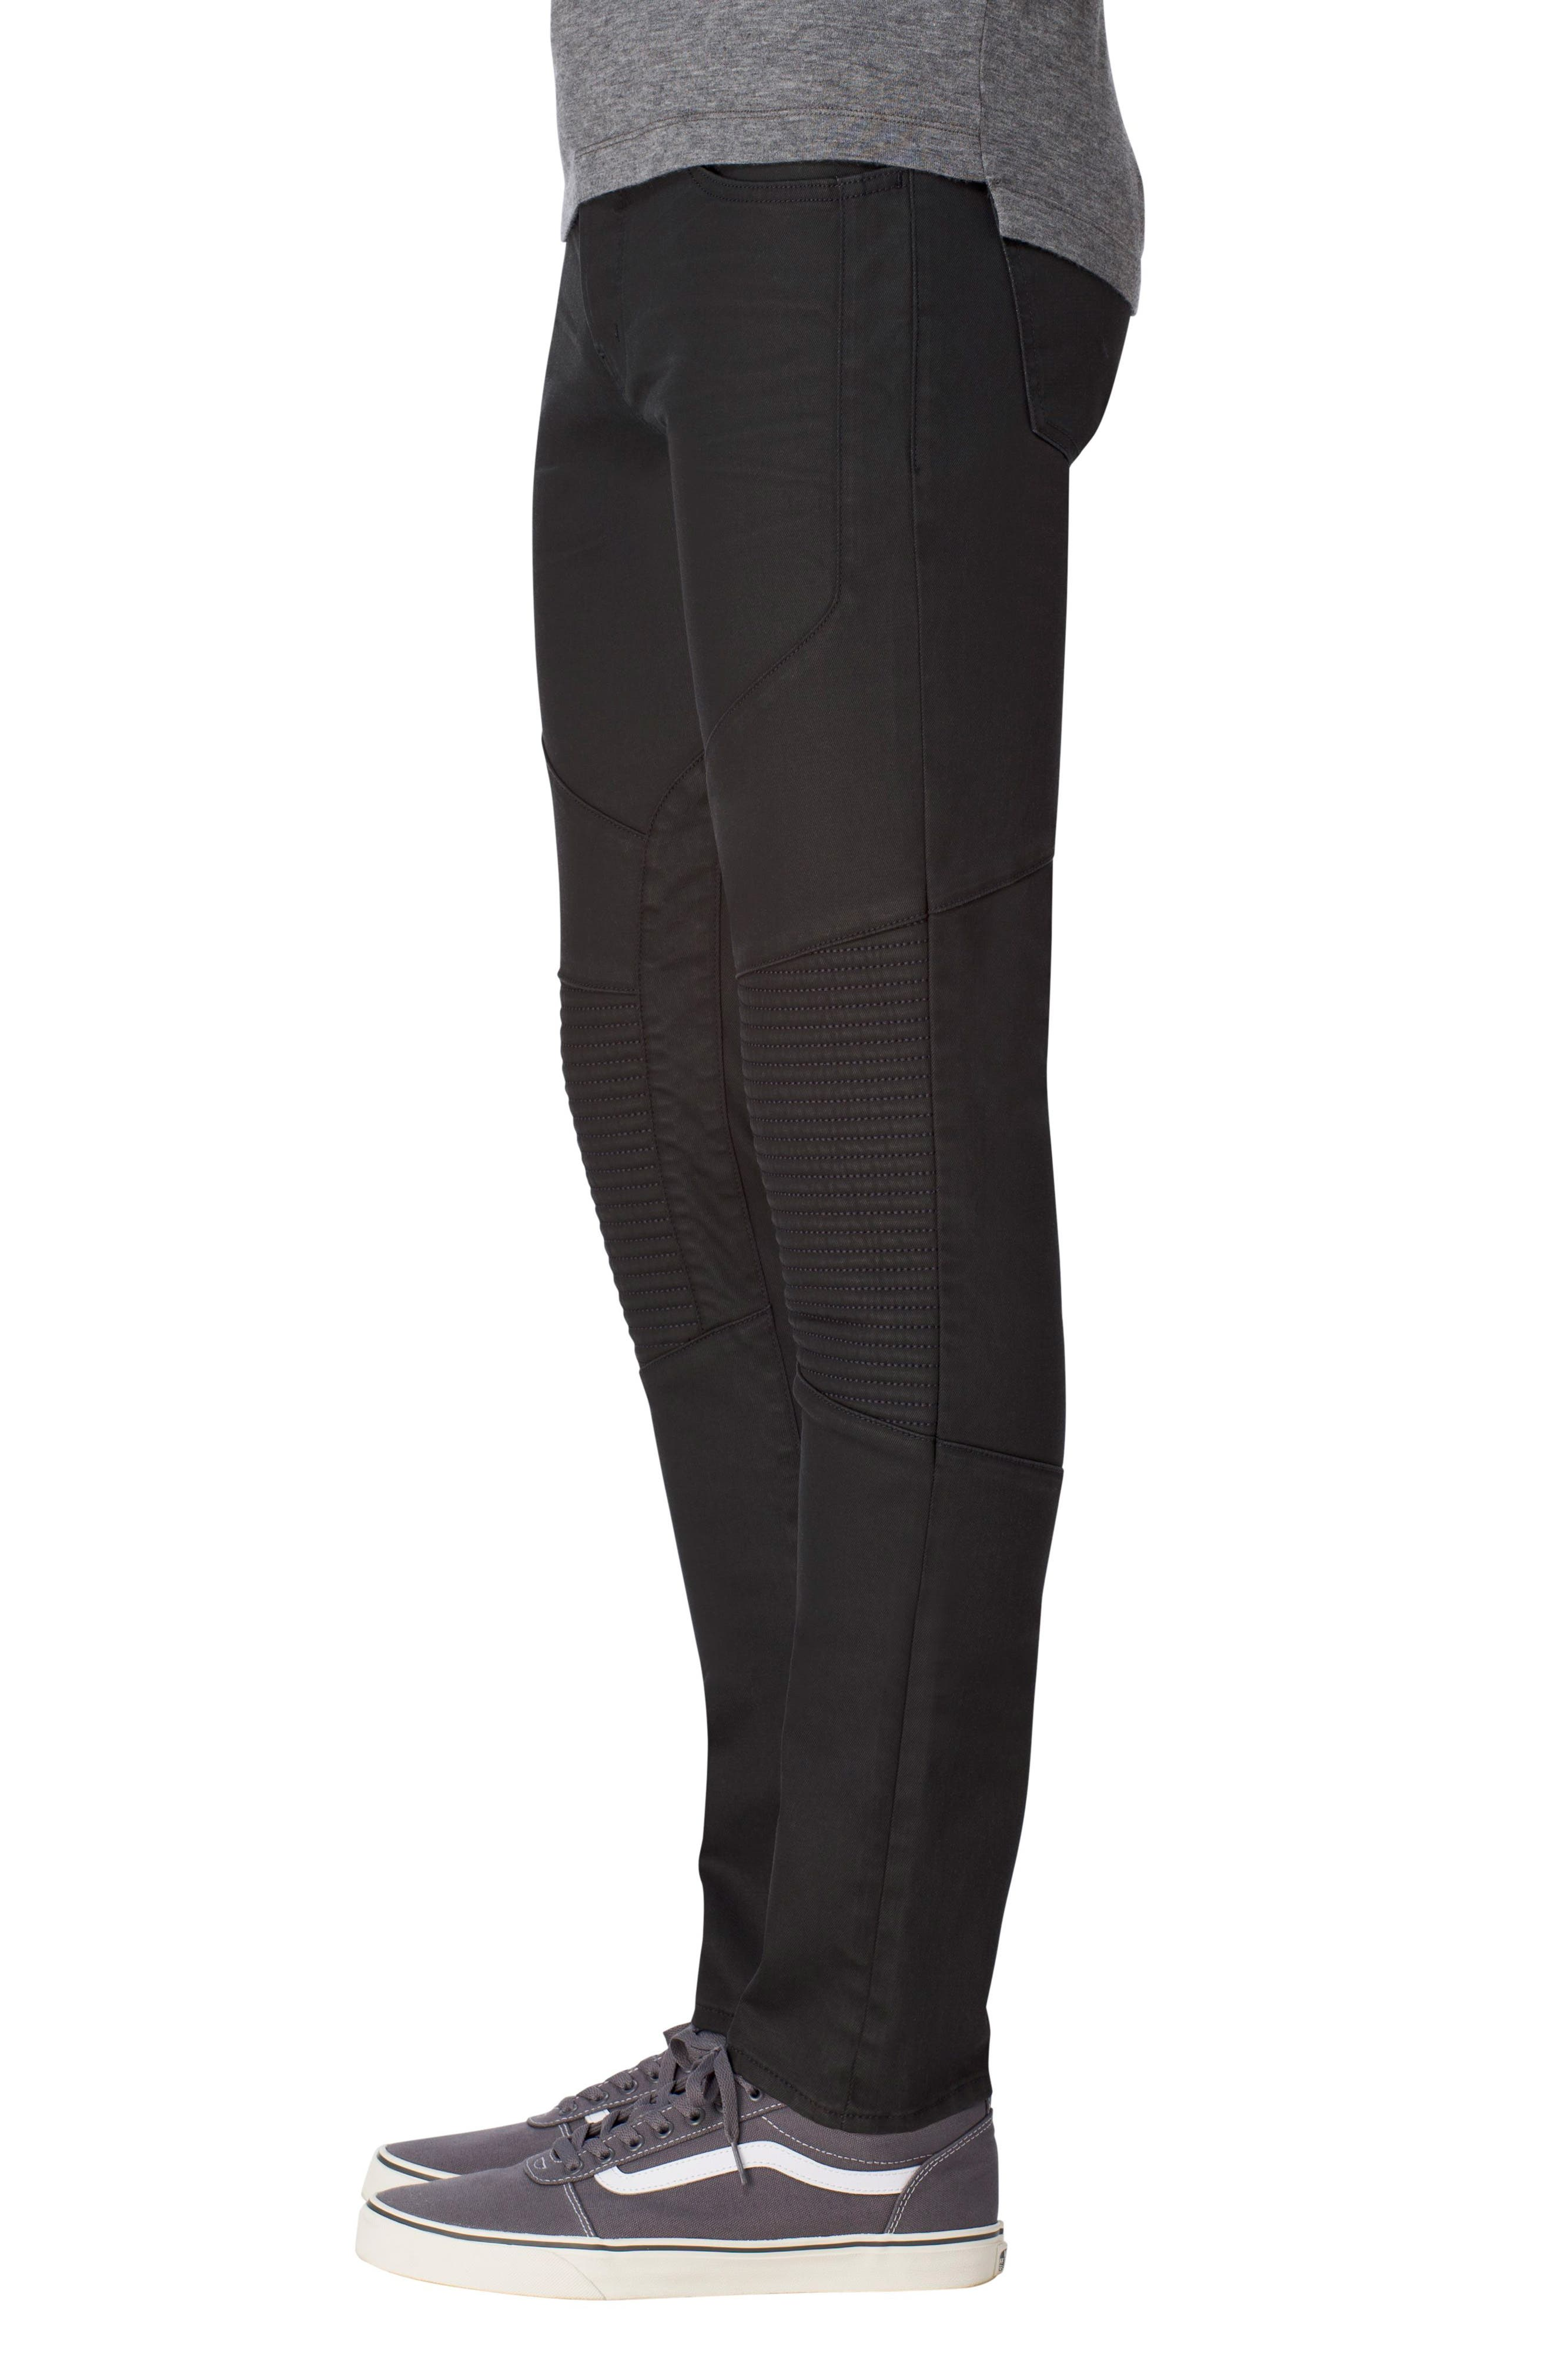 Bearden Moto Skinny Fit Jeans,                             Alternate thumbnail 3, color,